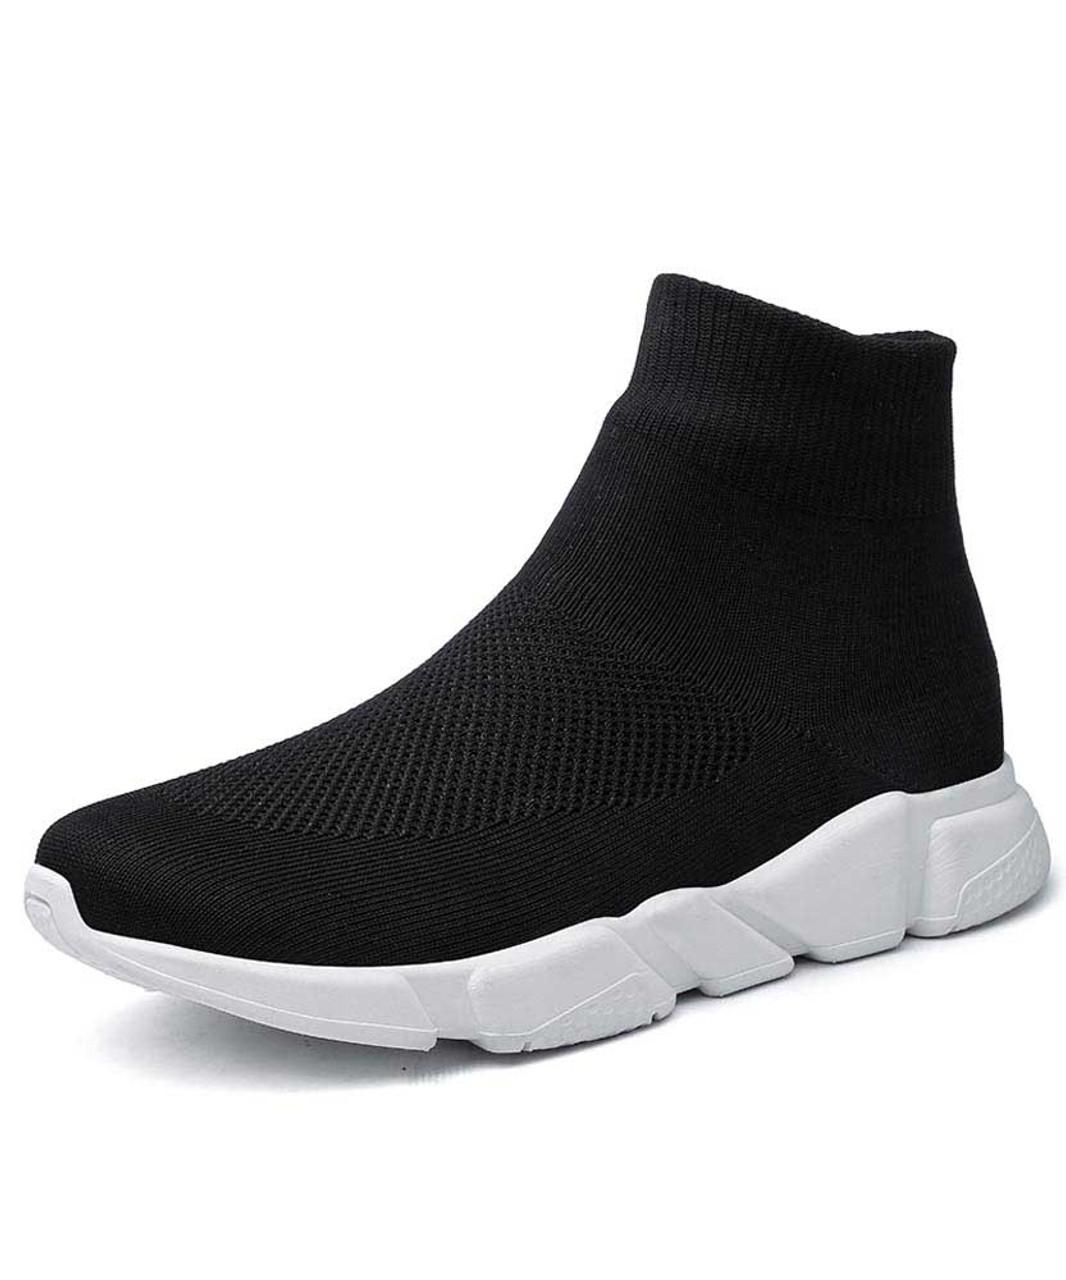 Black flyknit high top slip on sock